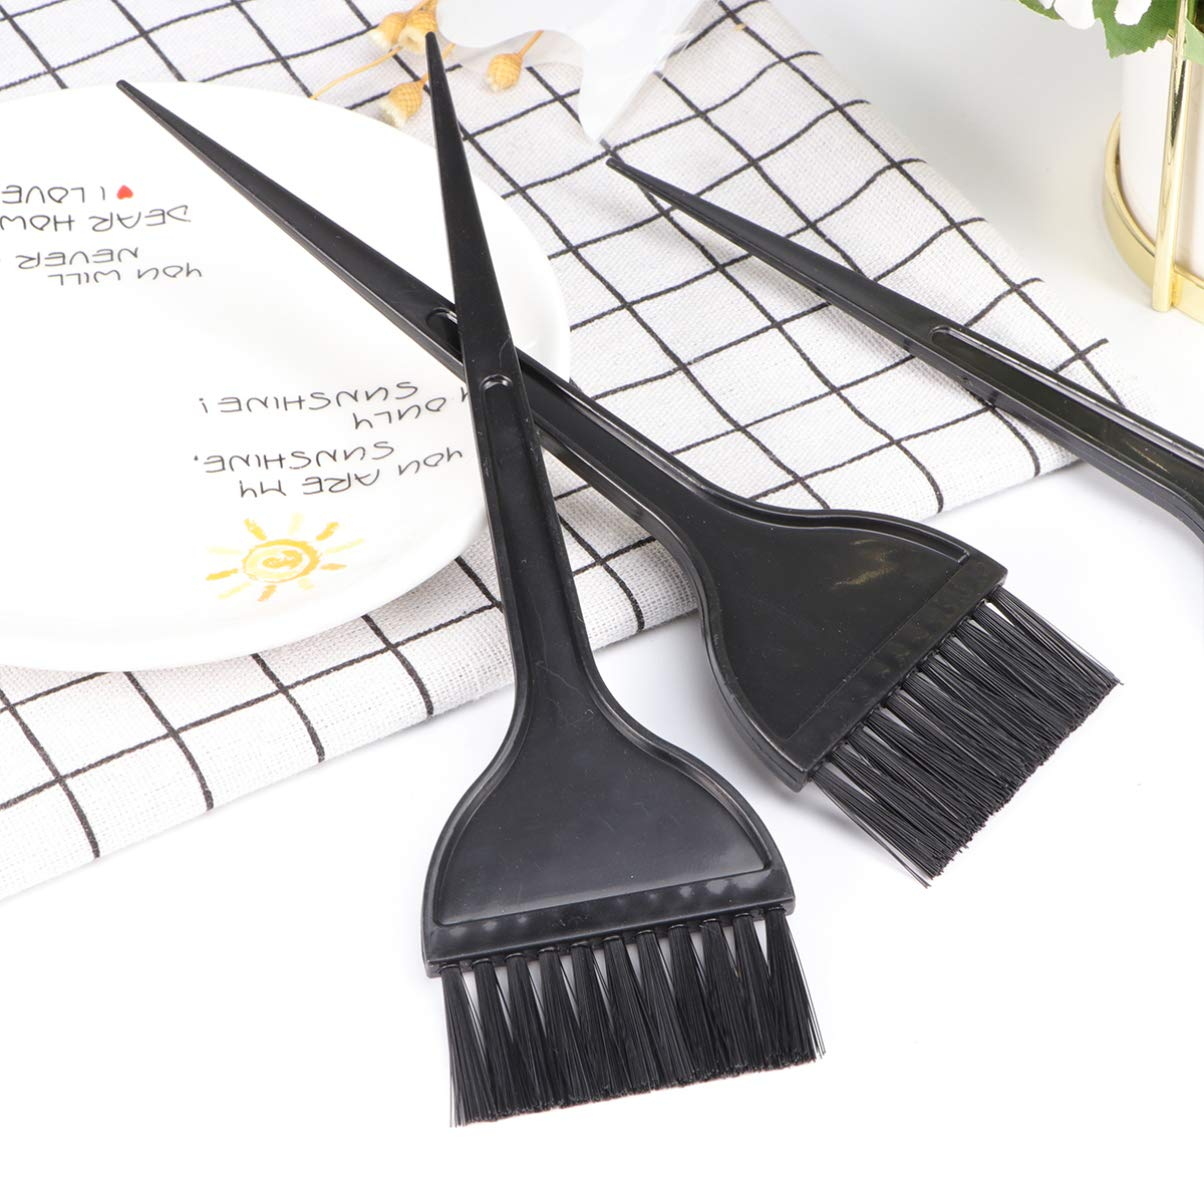 Hair Dye Brushes, Highlight Brush Handle Hair Coloring Dyeing Kit Color Tint Applicator 12 Pack